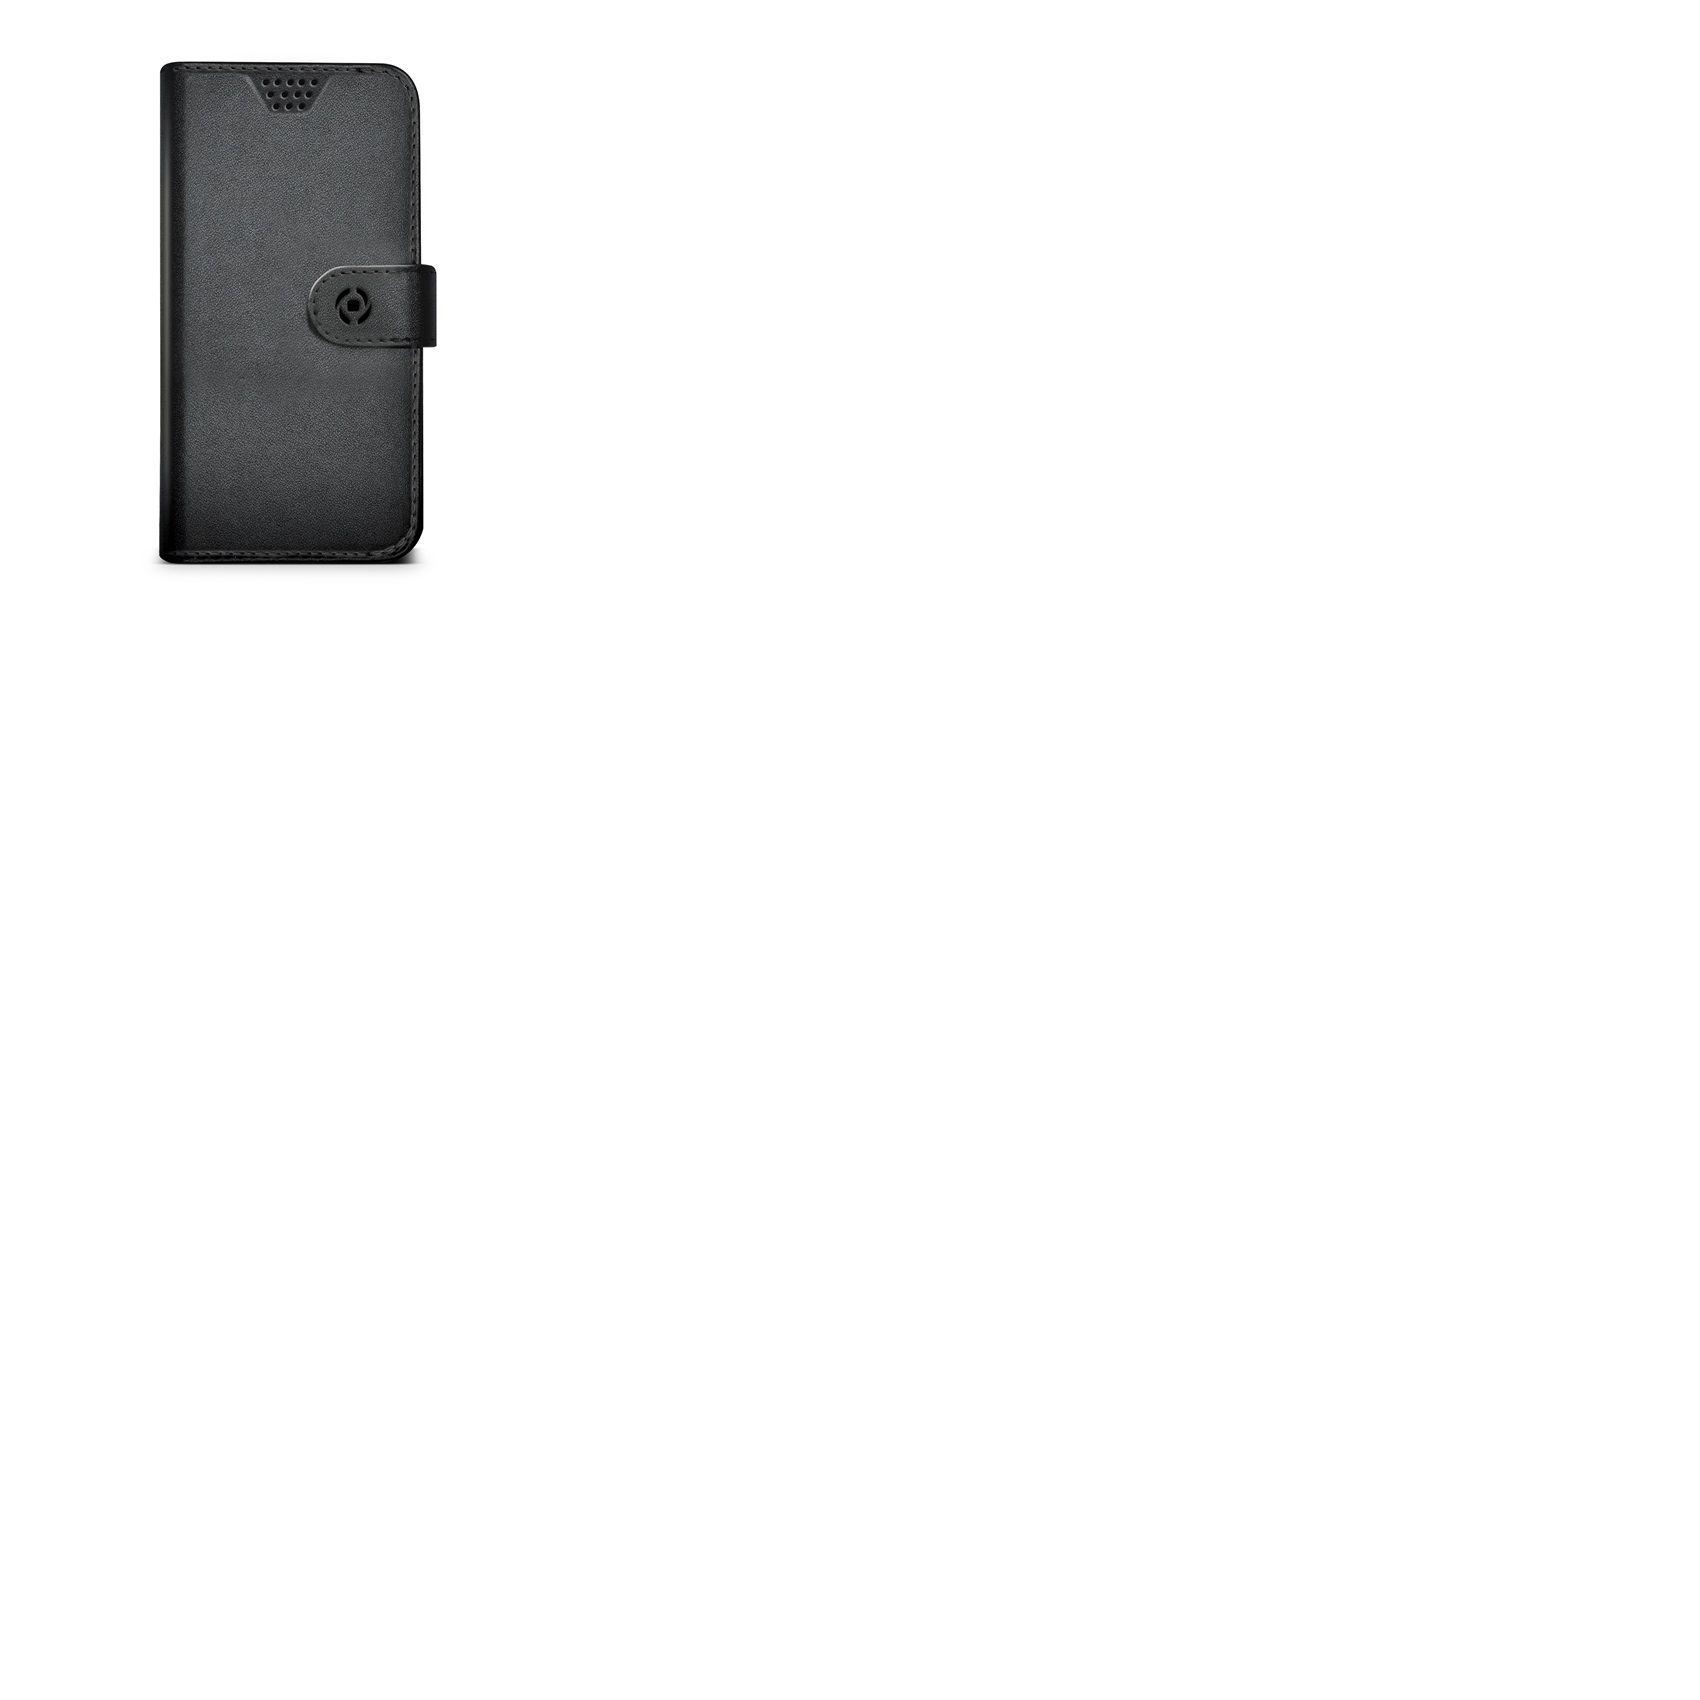 "Pouzdro typu kniha CELLY Wally Unica, velikost XXL, 5"" - 5.7"", černé"